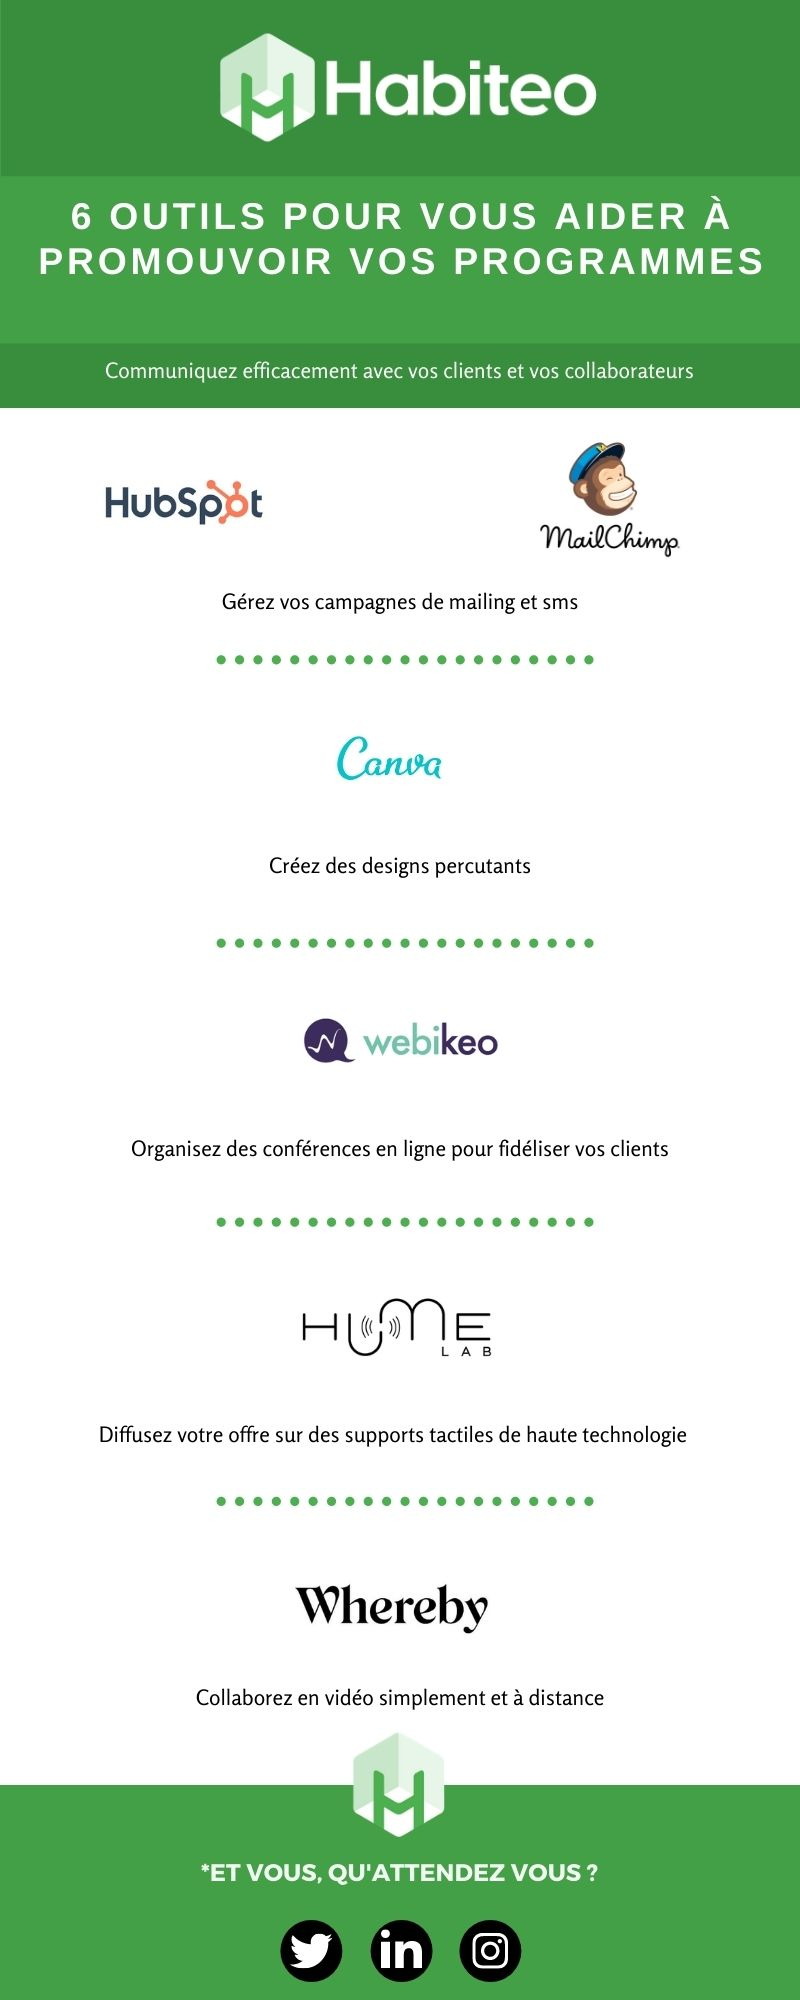 HubSpot, Mailchimp, Canva, Webikeo, HUMElab